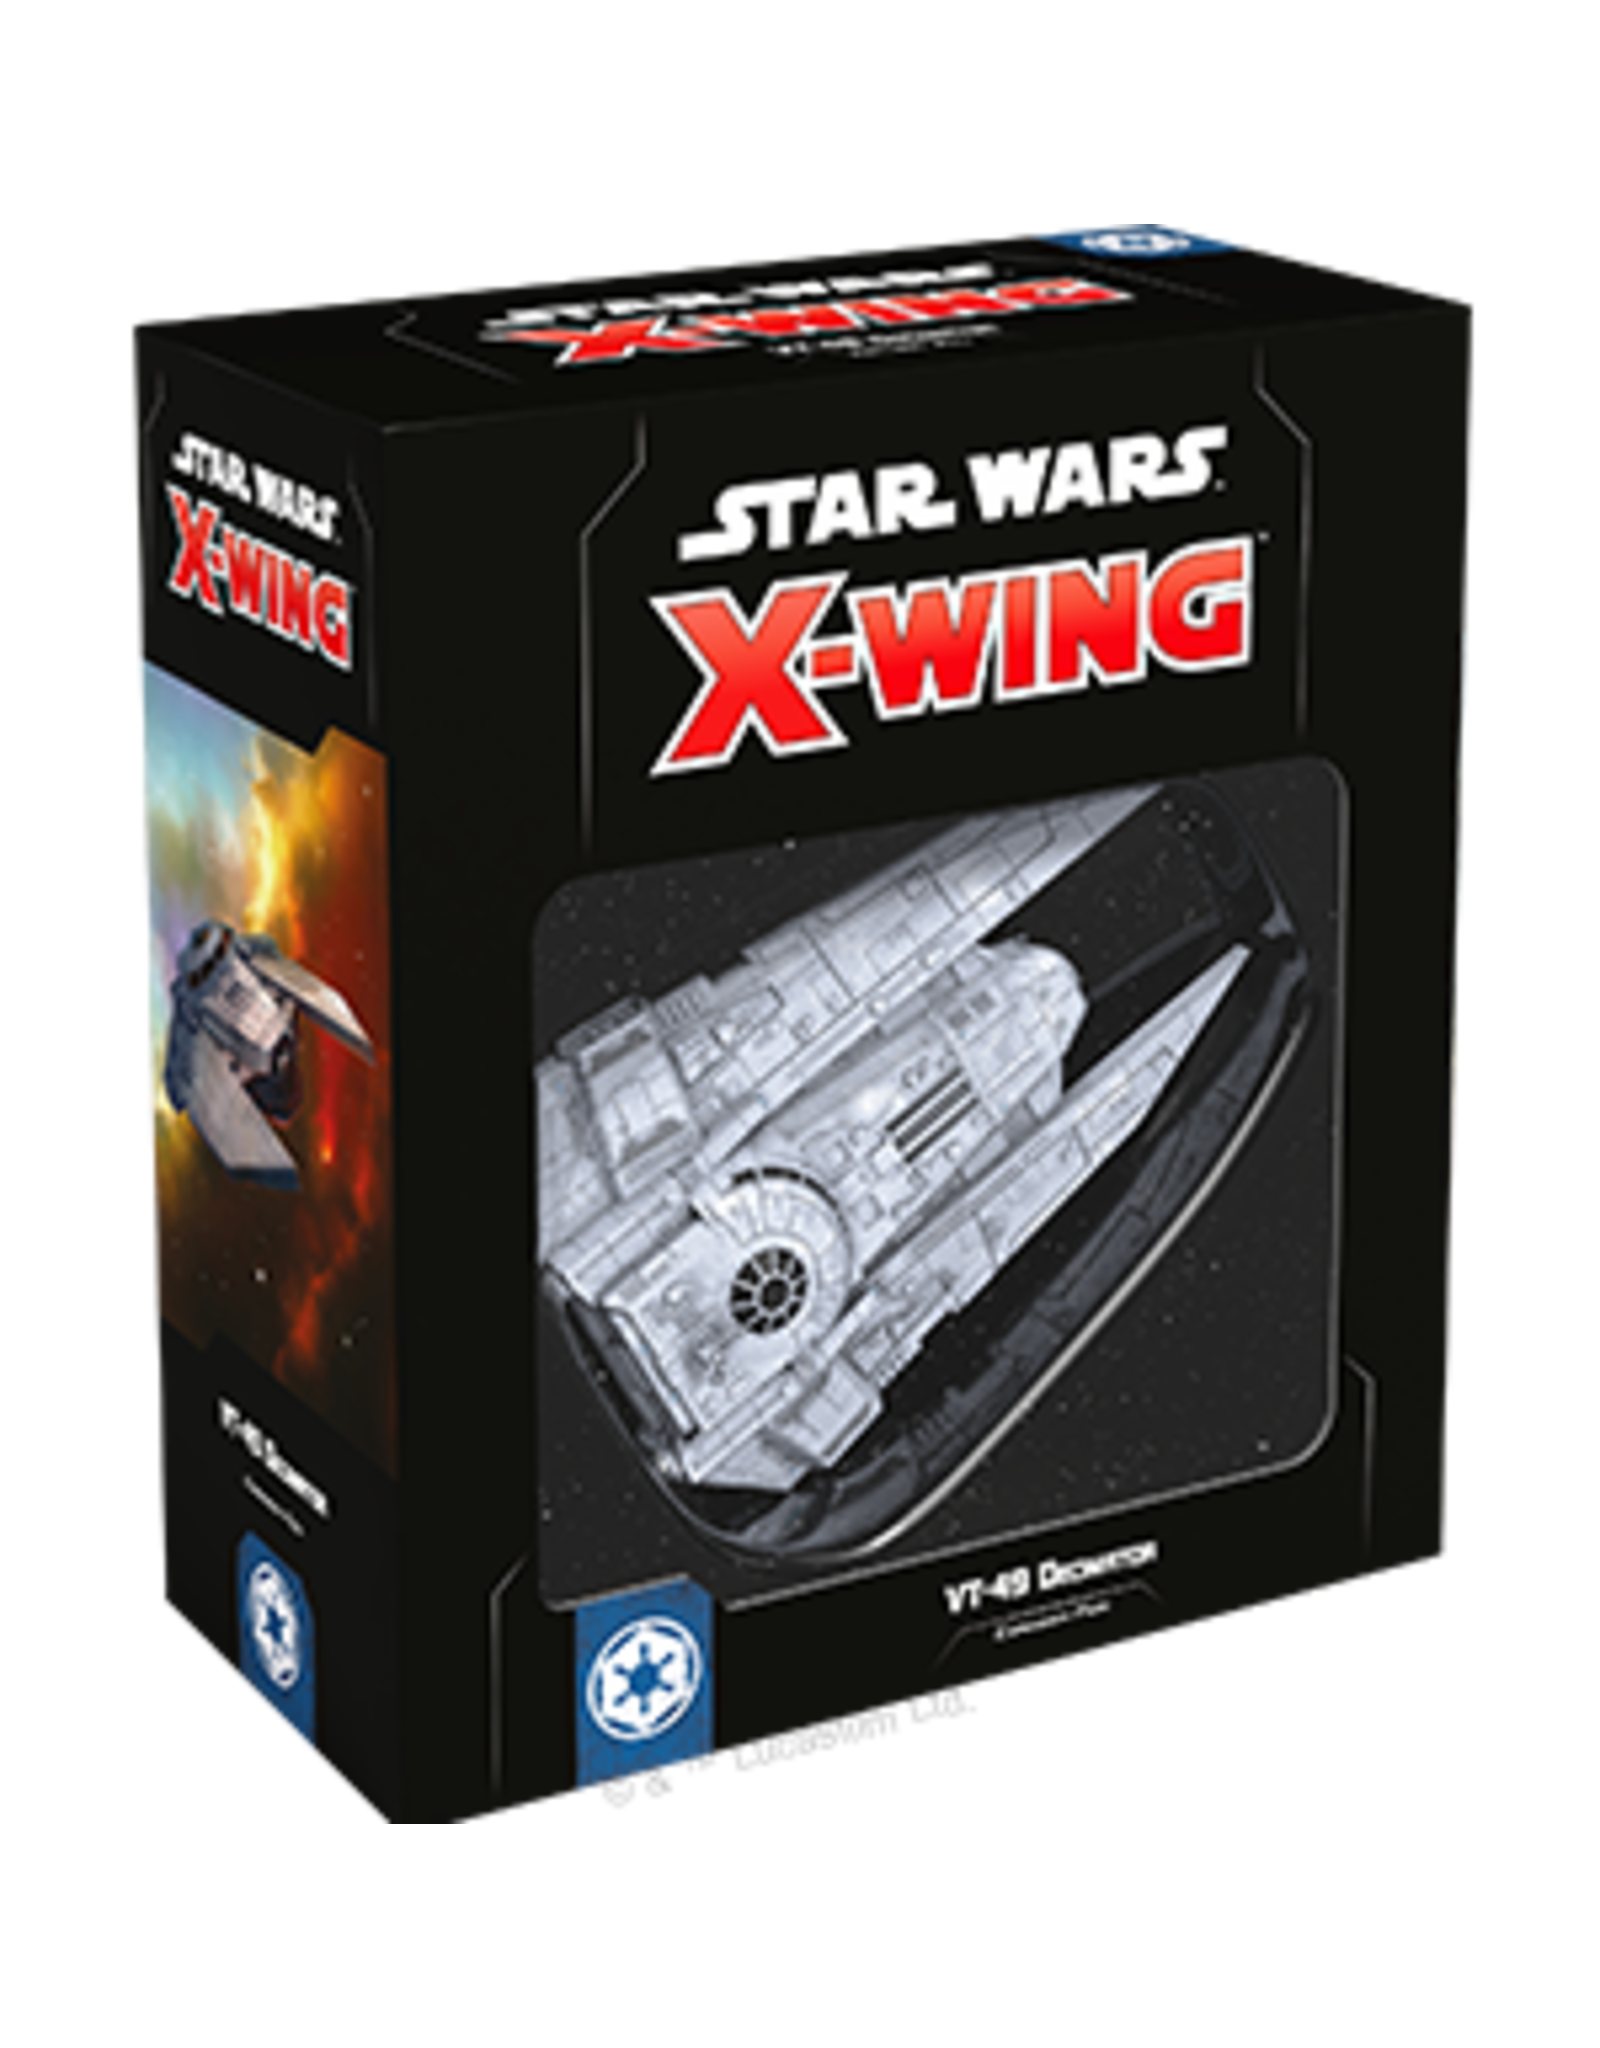 Fantasy Flight Games Star Wars X-Wing: 2nd Edition - VT-49 Decimator Expansion Pack